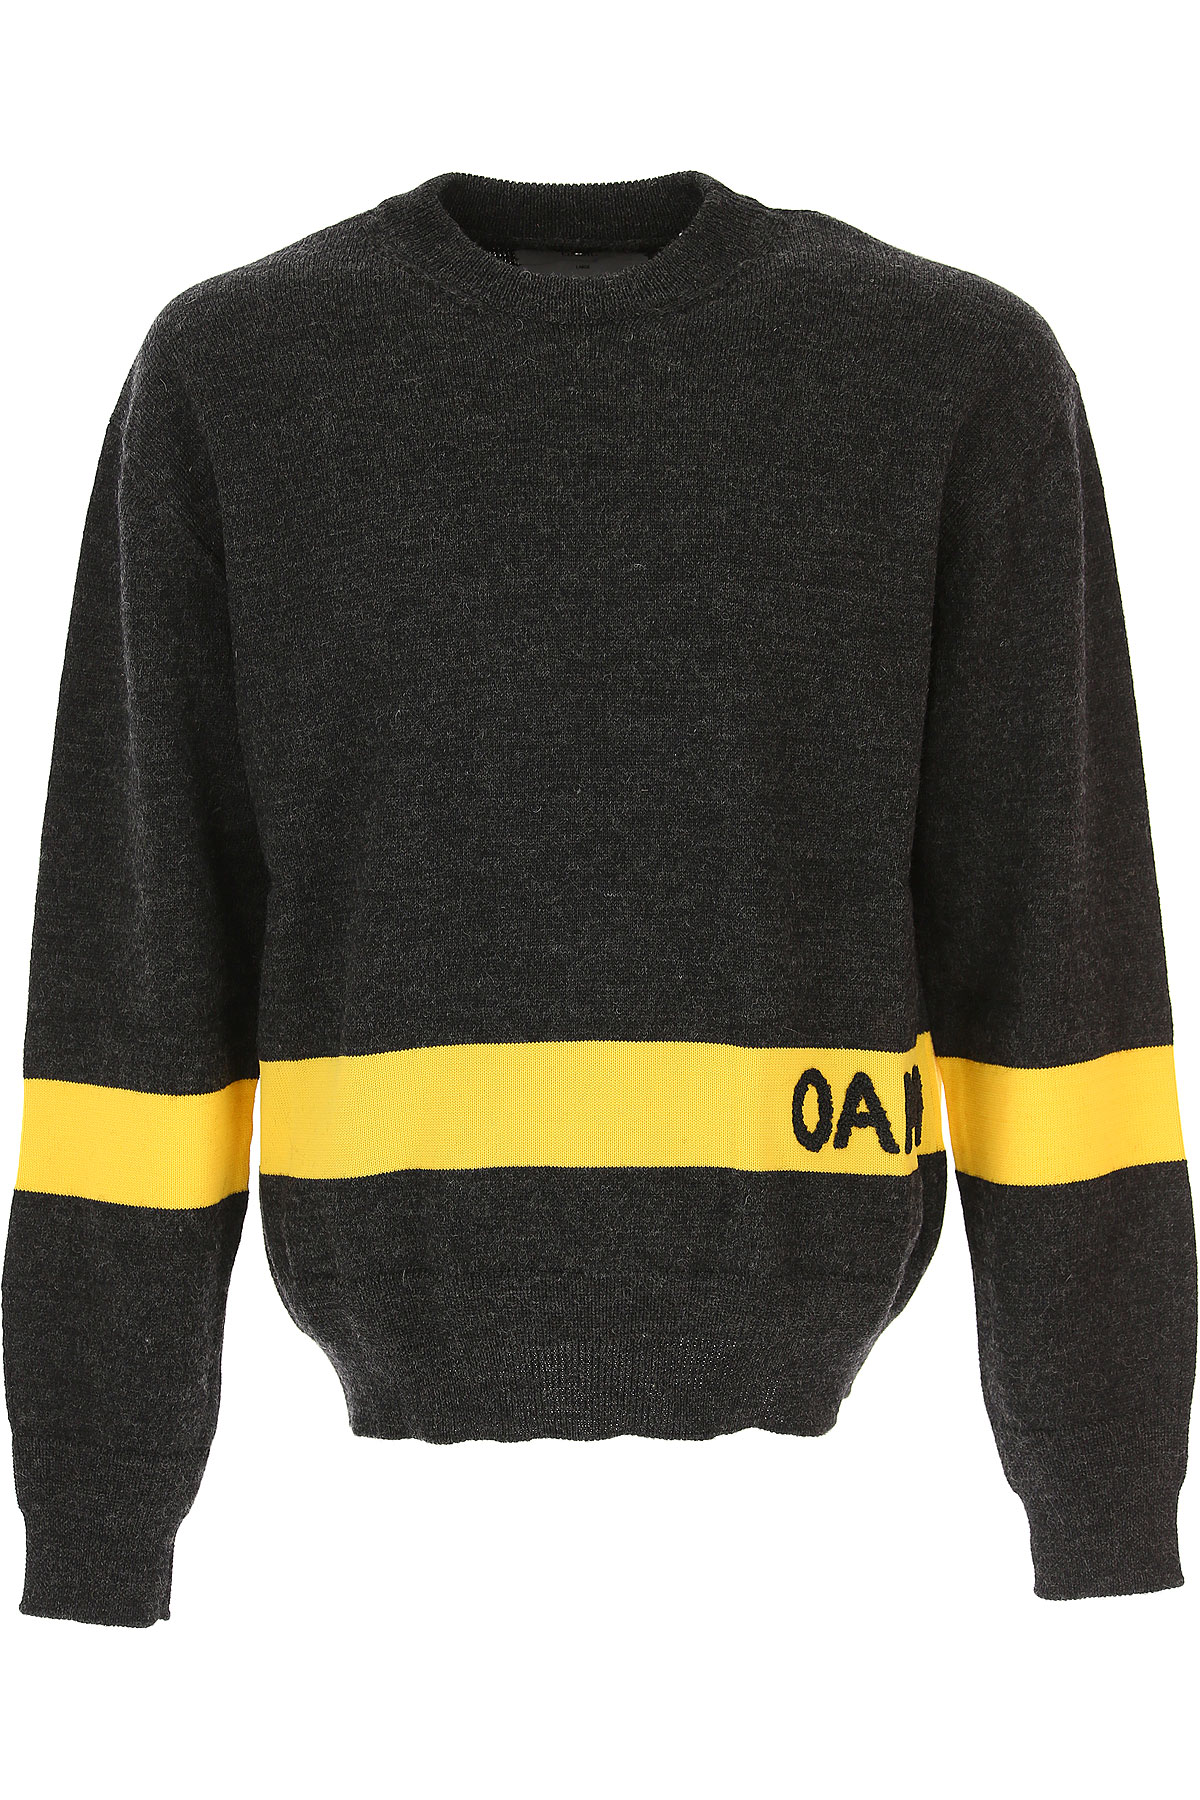 Image of OAMC Sweater for Men Jumper, Grey Melange, Wool, 2017, L M S XS